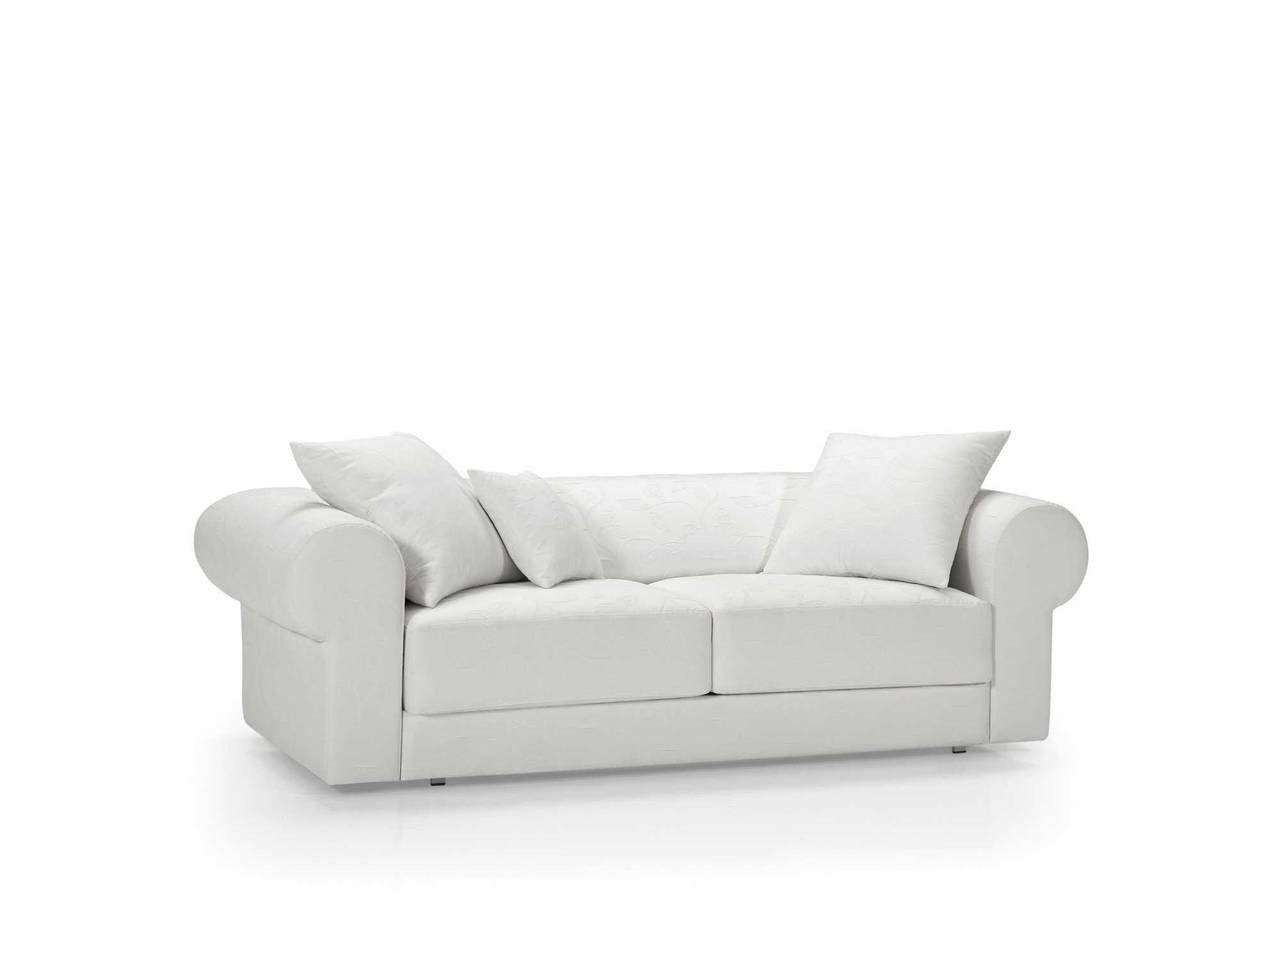 Canapé Convertible Vrai Lit Charmant 30 Luxe Canapé Convertible Vrai Matelas Suggestions